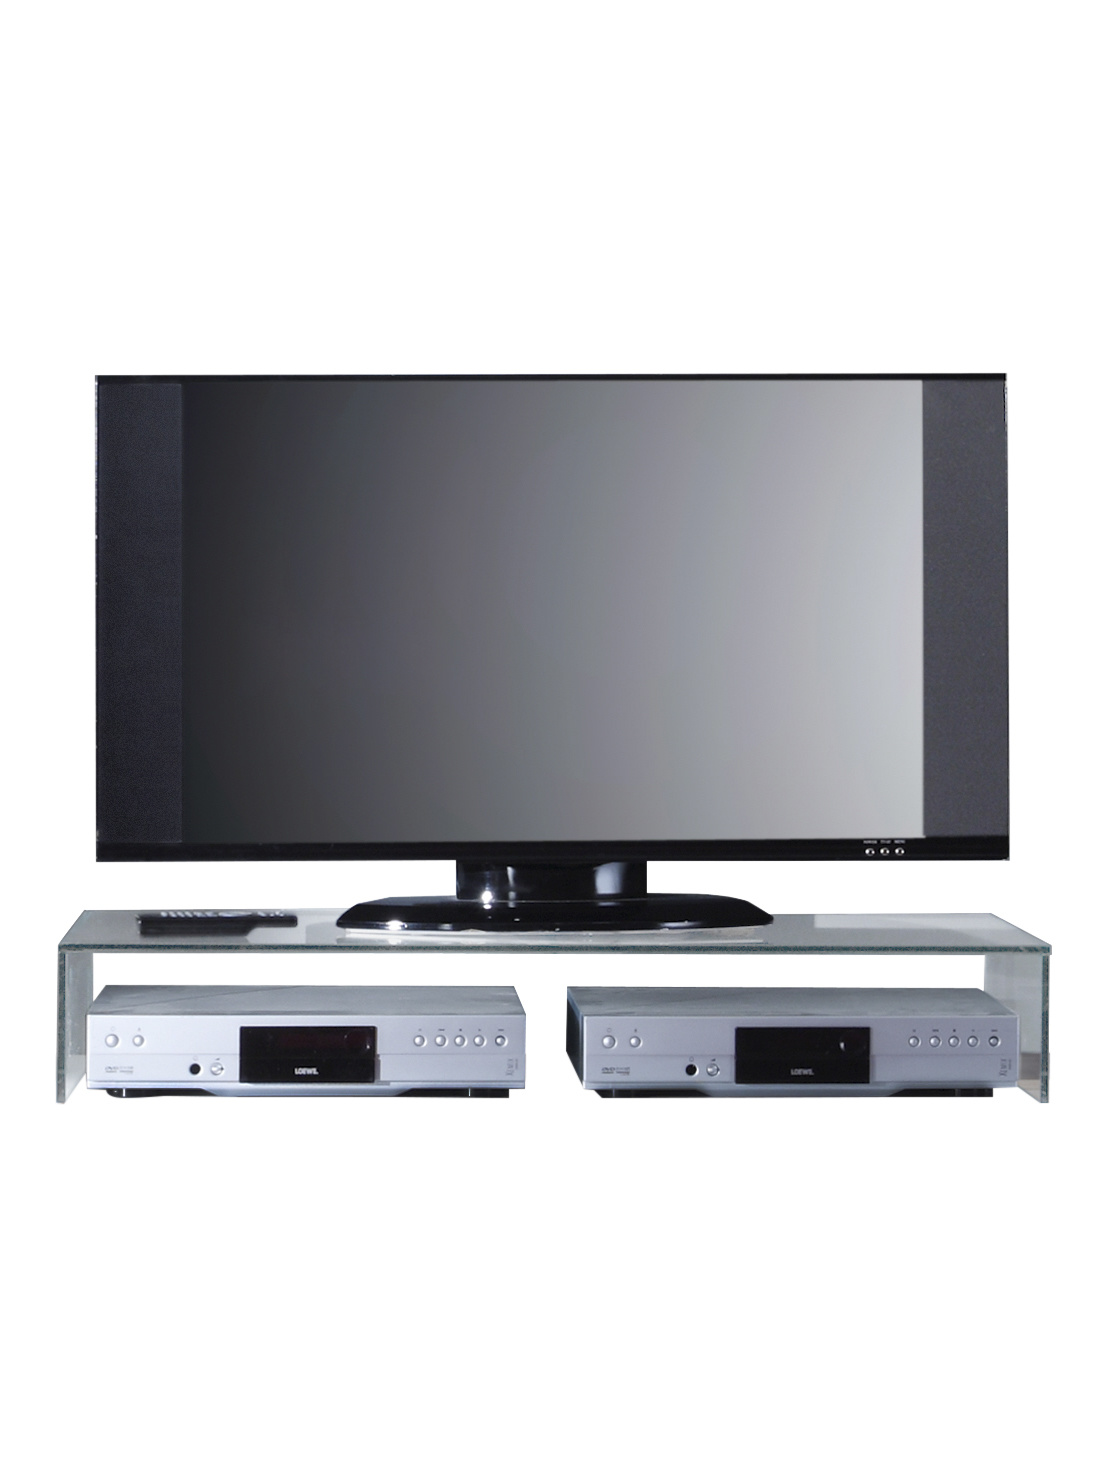 Tv Meubel Plank.Uni Tv Meubel Accessoires Glazen Plank